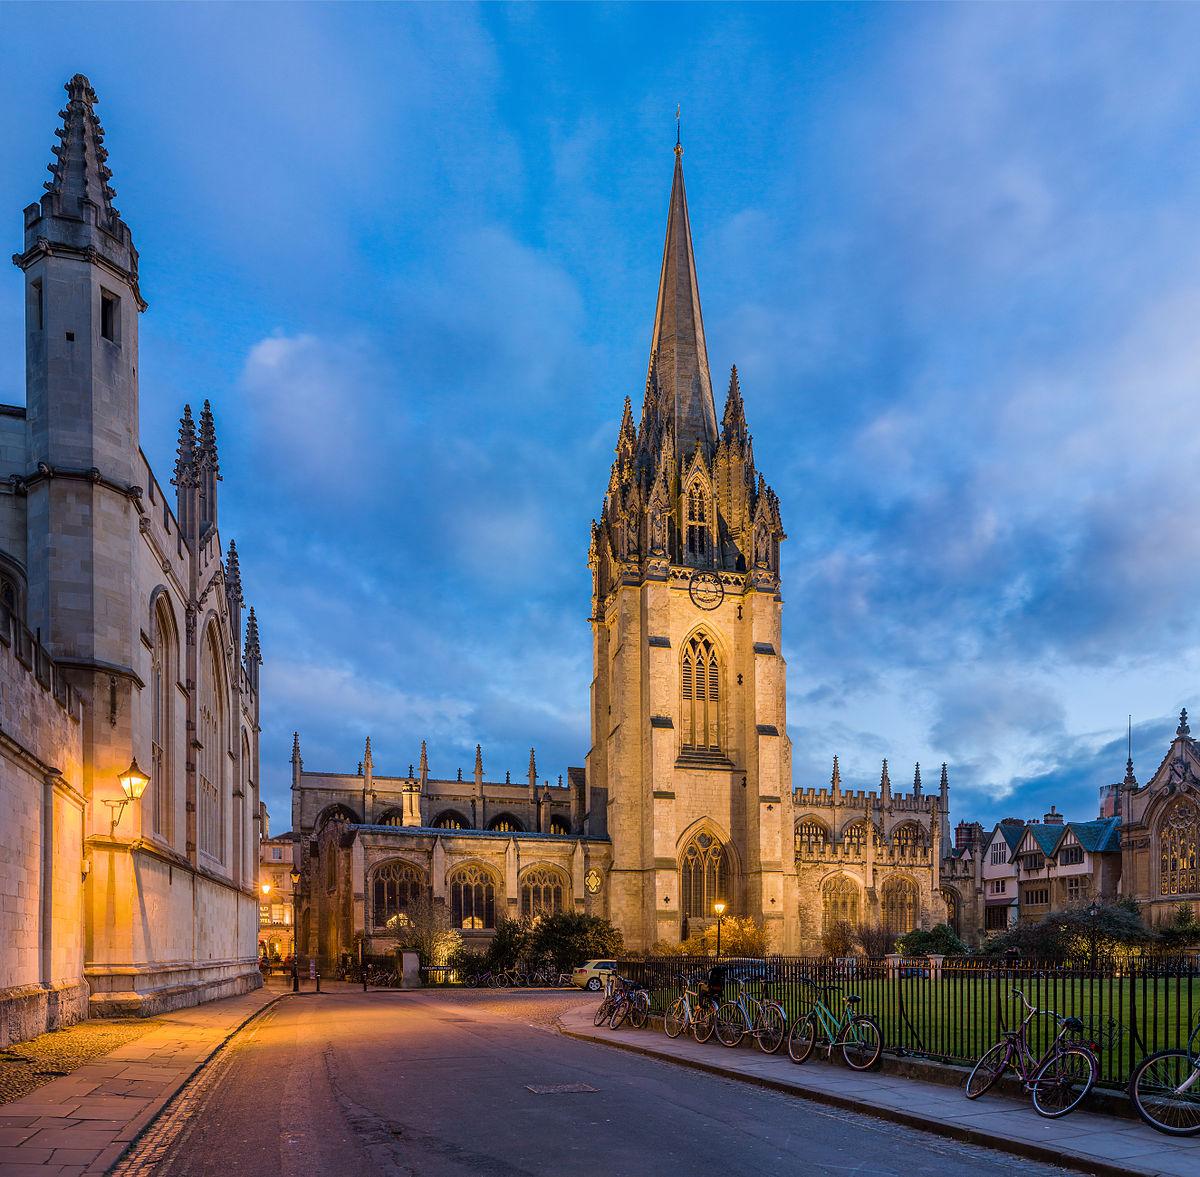 University Church of St Mary the Virgin -